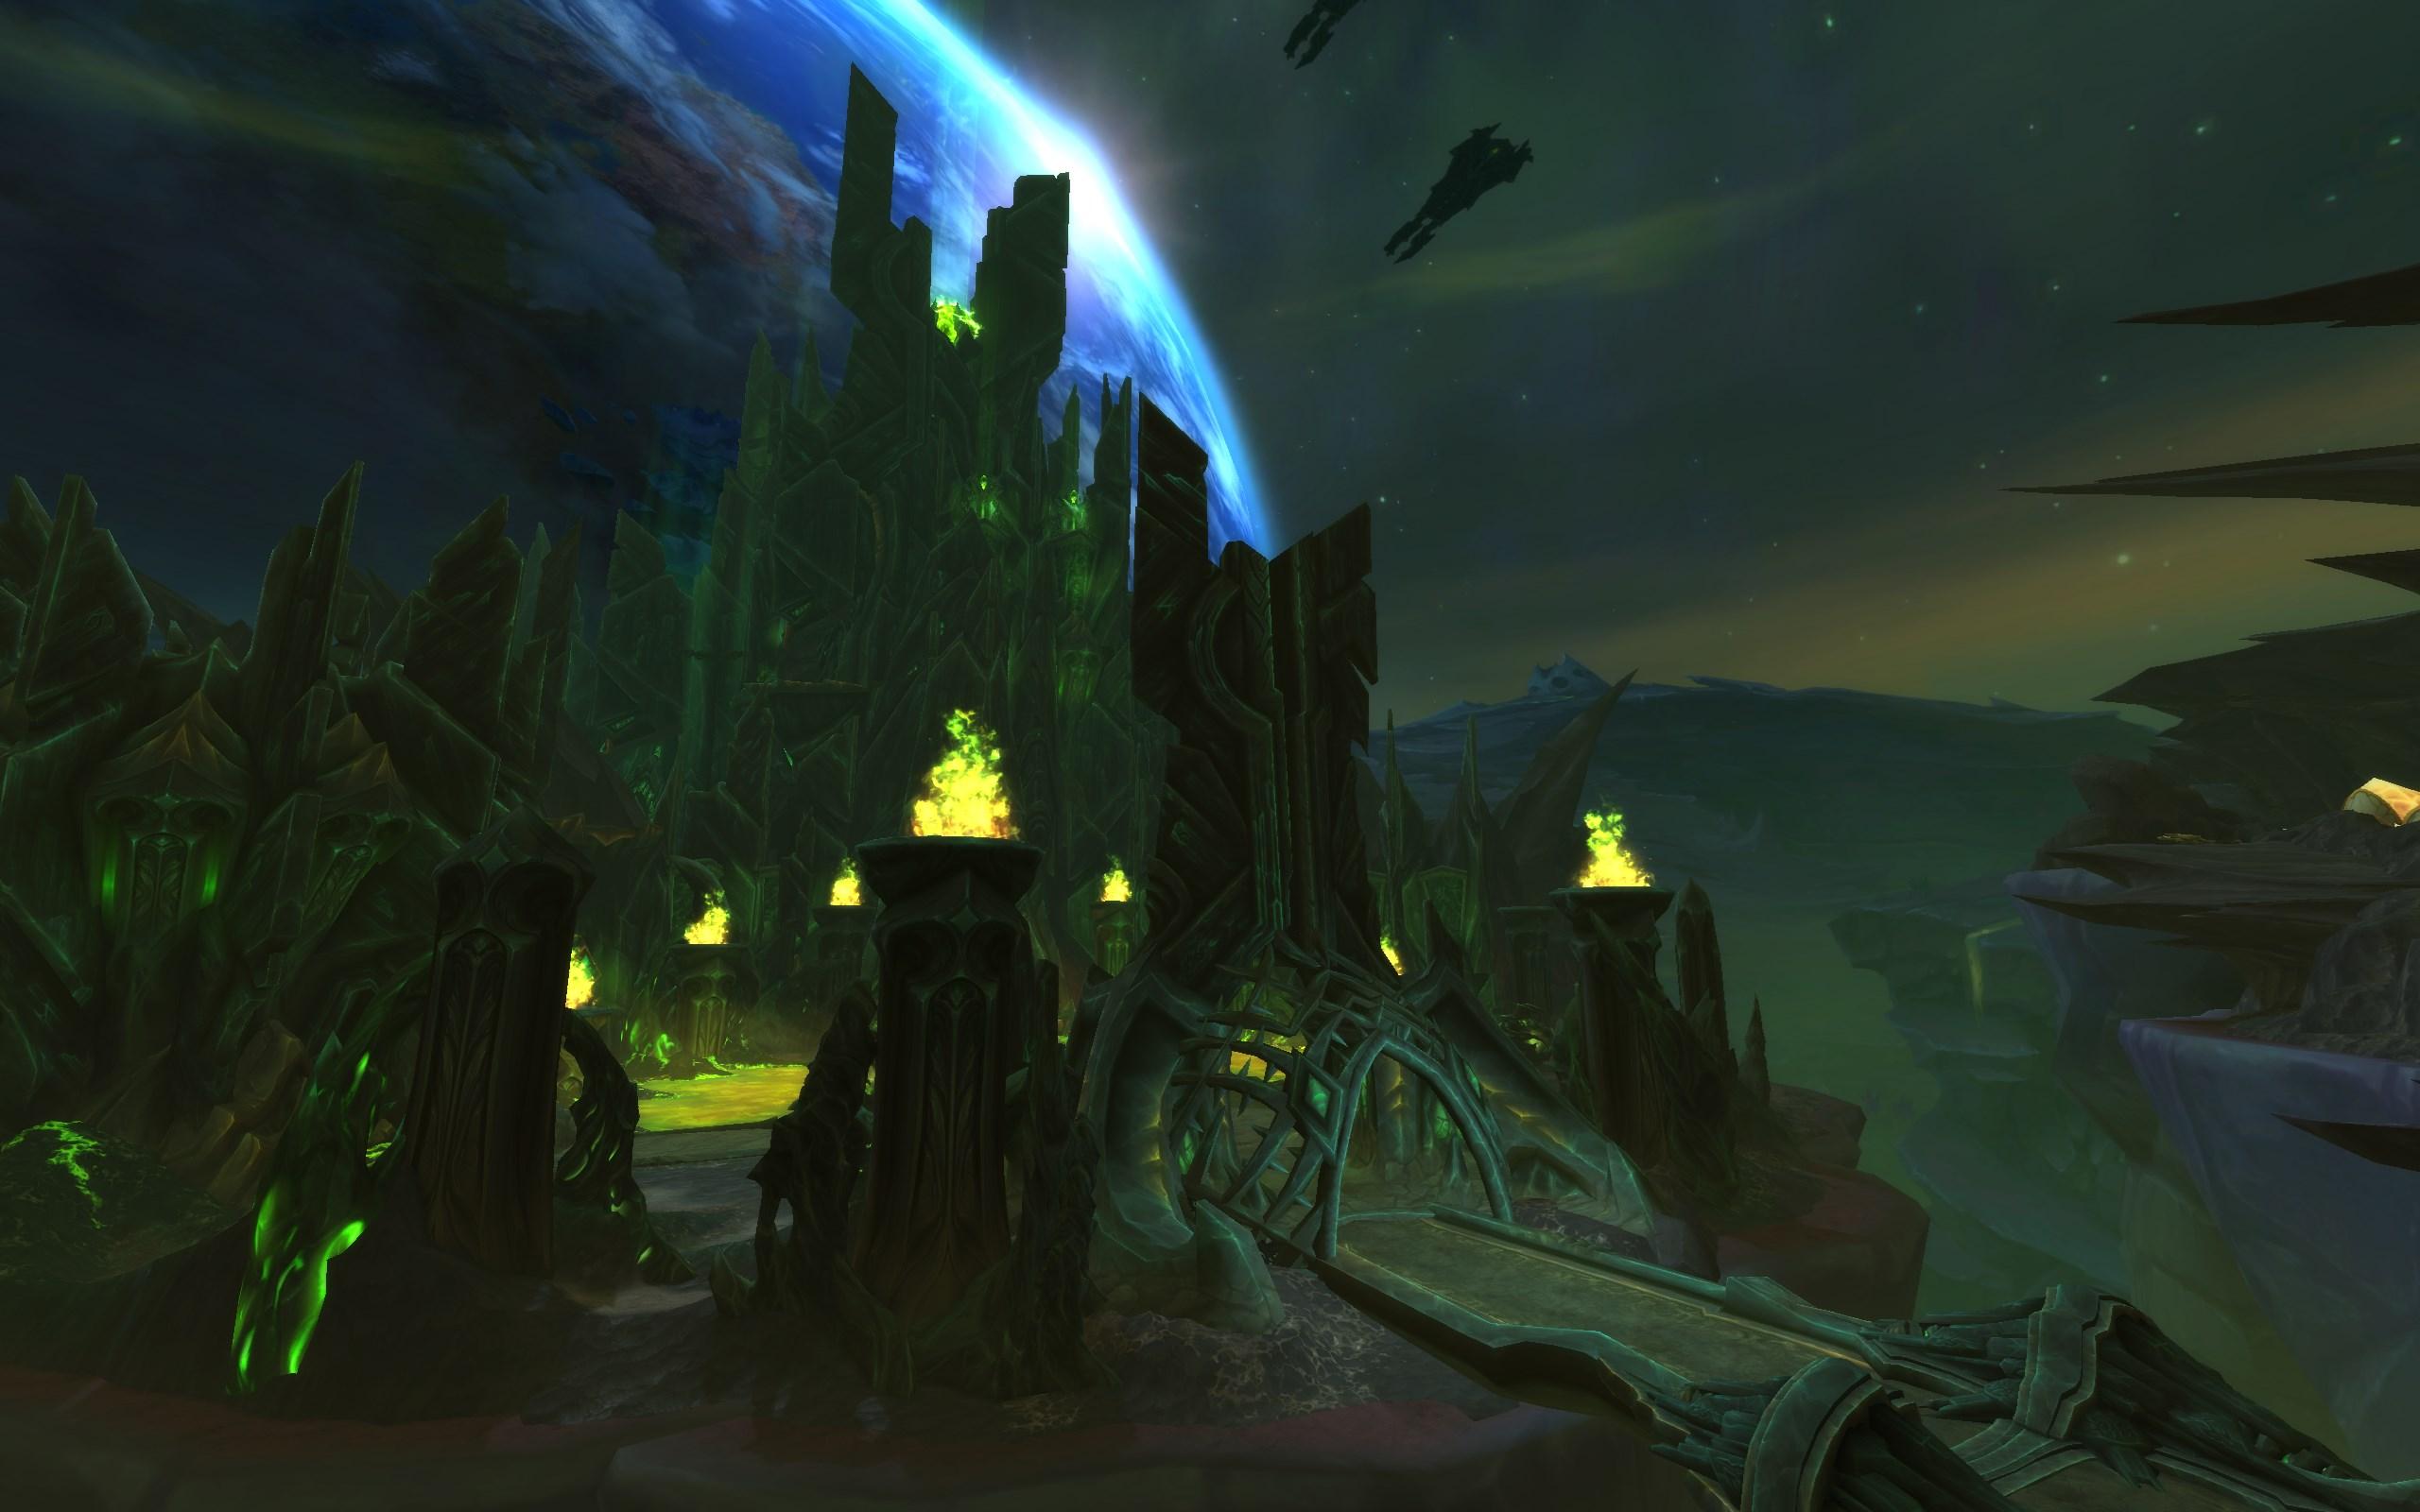 World of Warcraft WoW Antorus the burning throne screenshot